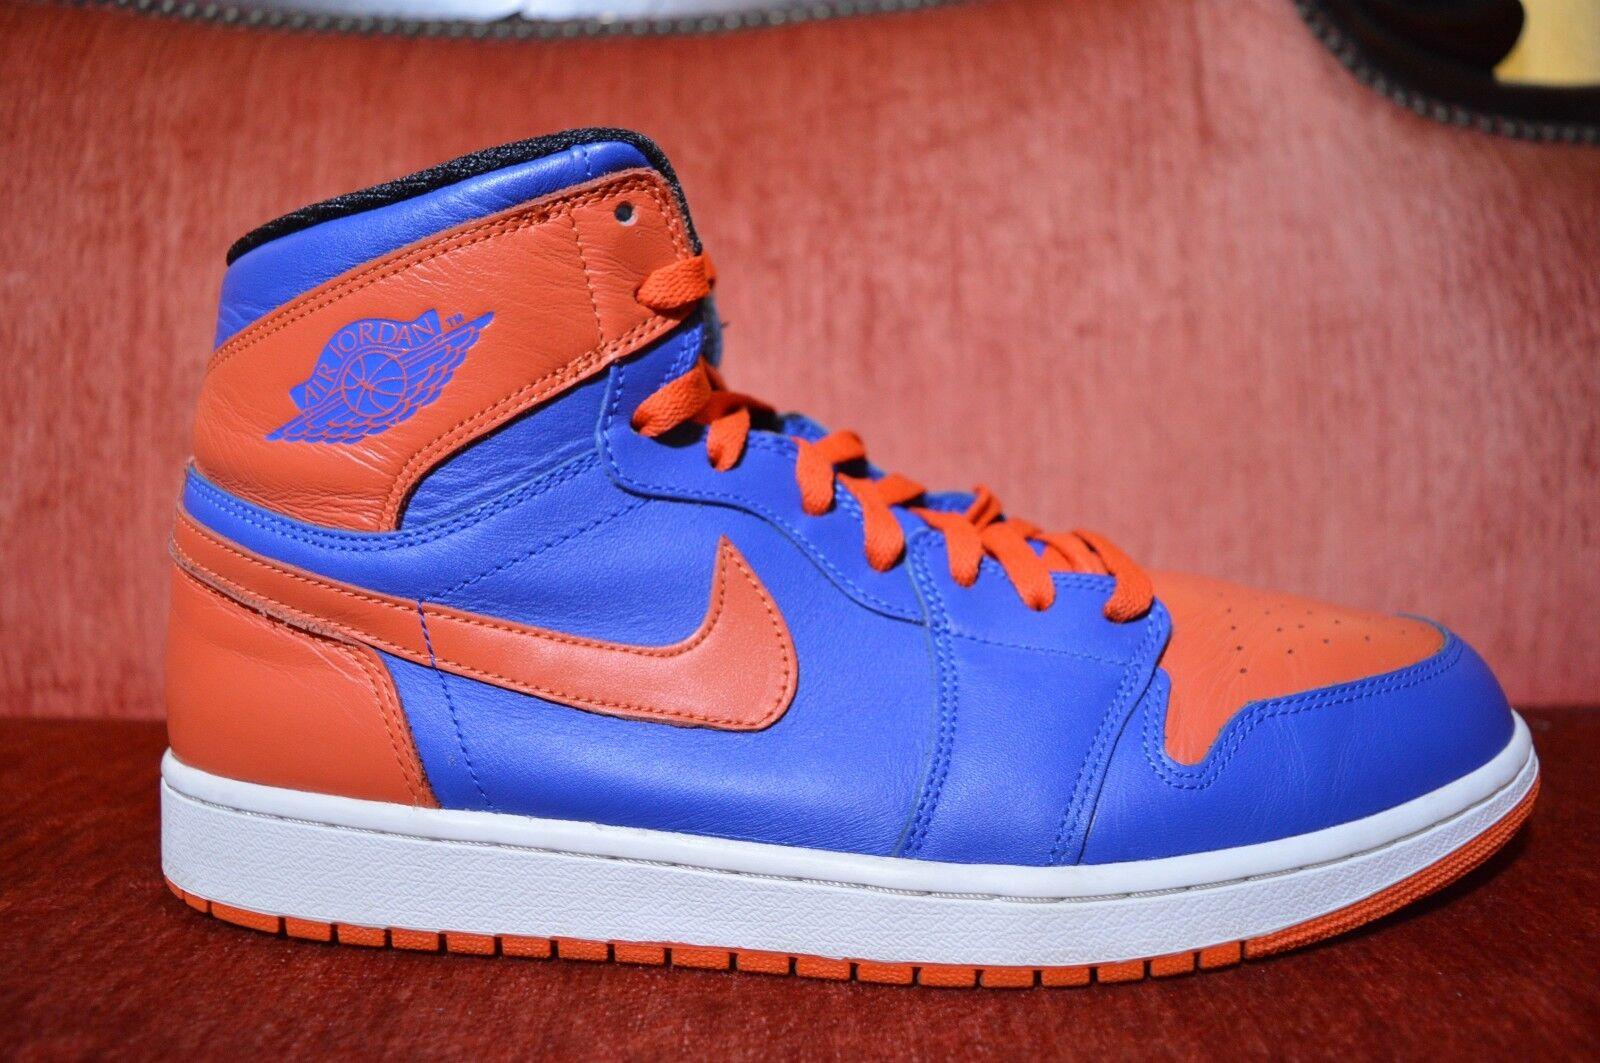 VNDS Nike Air Jordan 1 Retro High OG Knicks Royal Blue Orange Size 13 555088-407